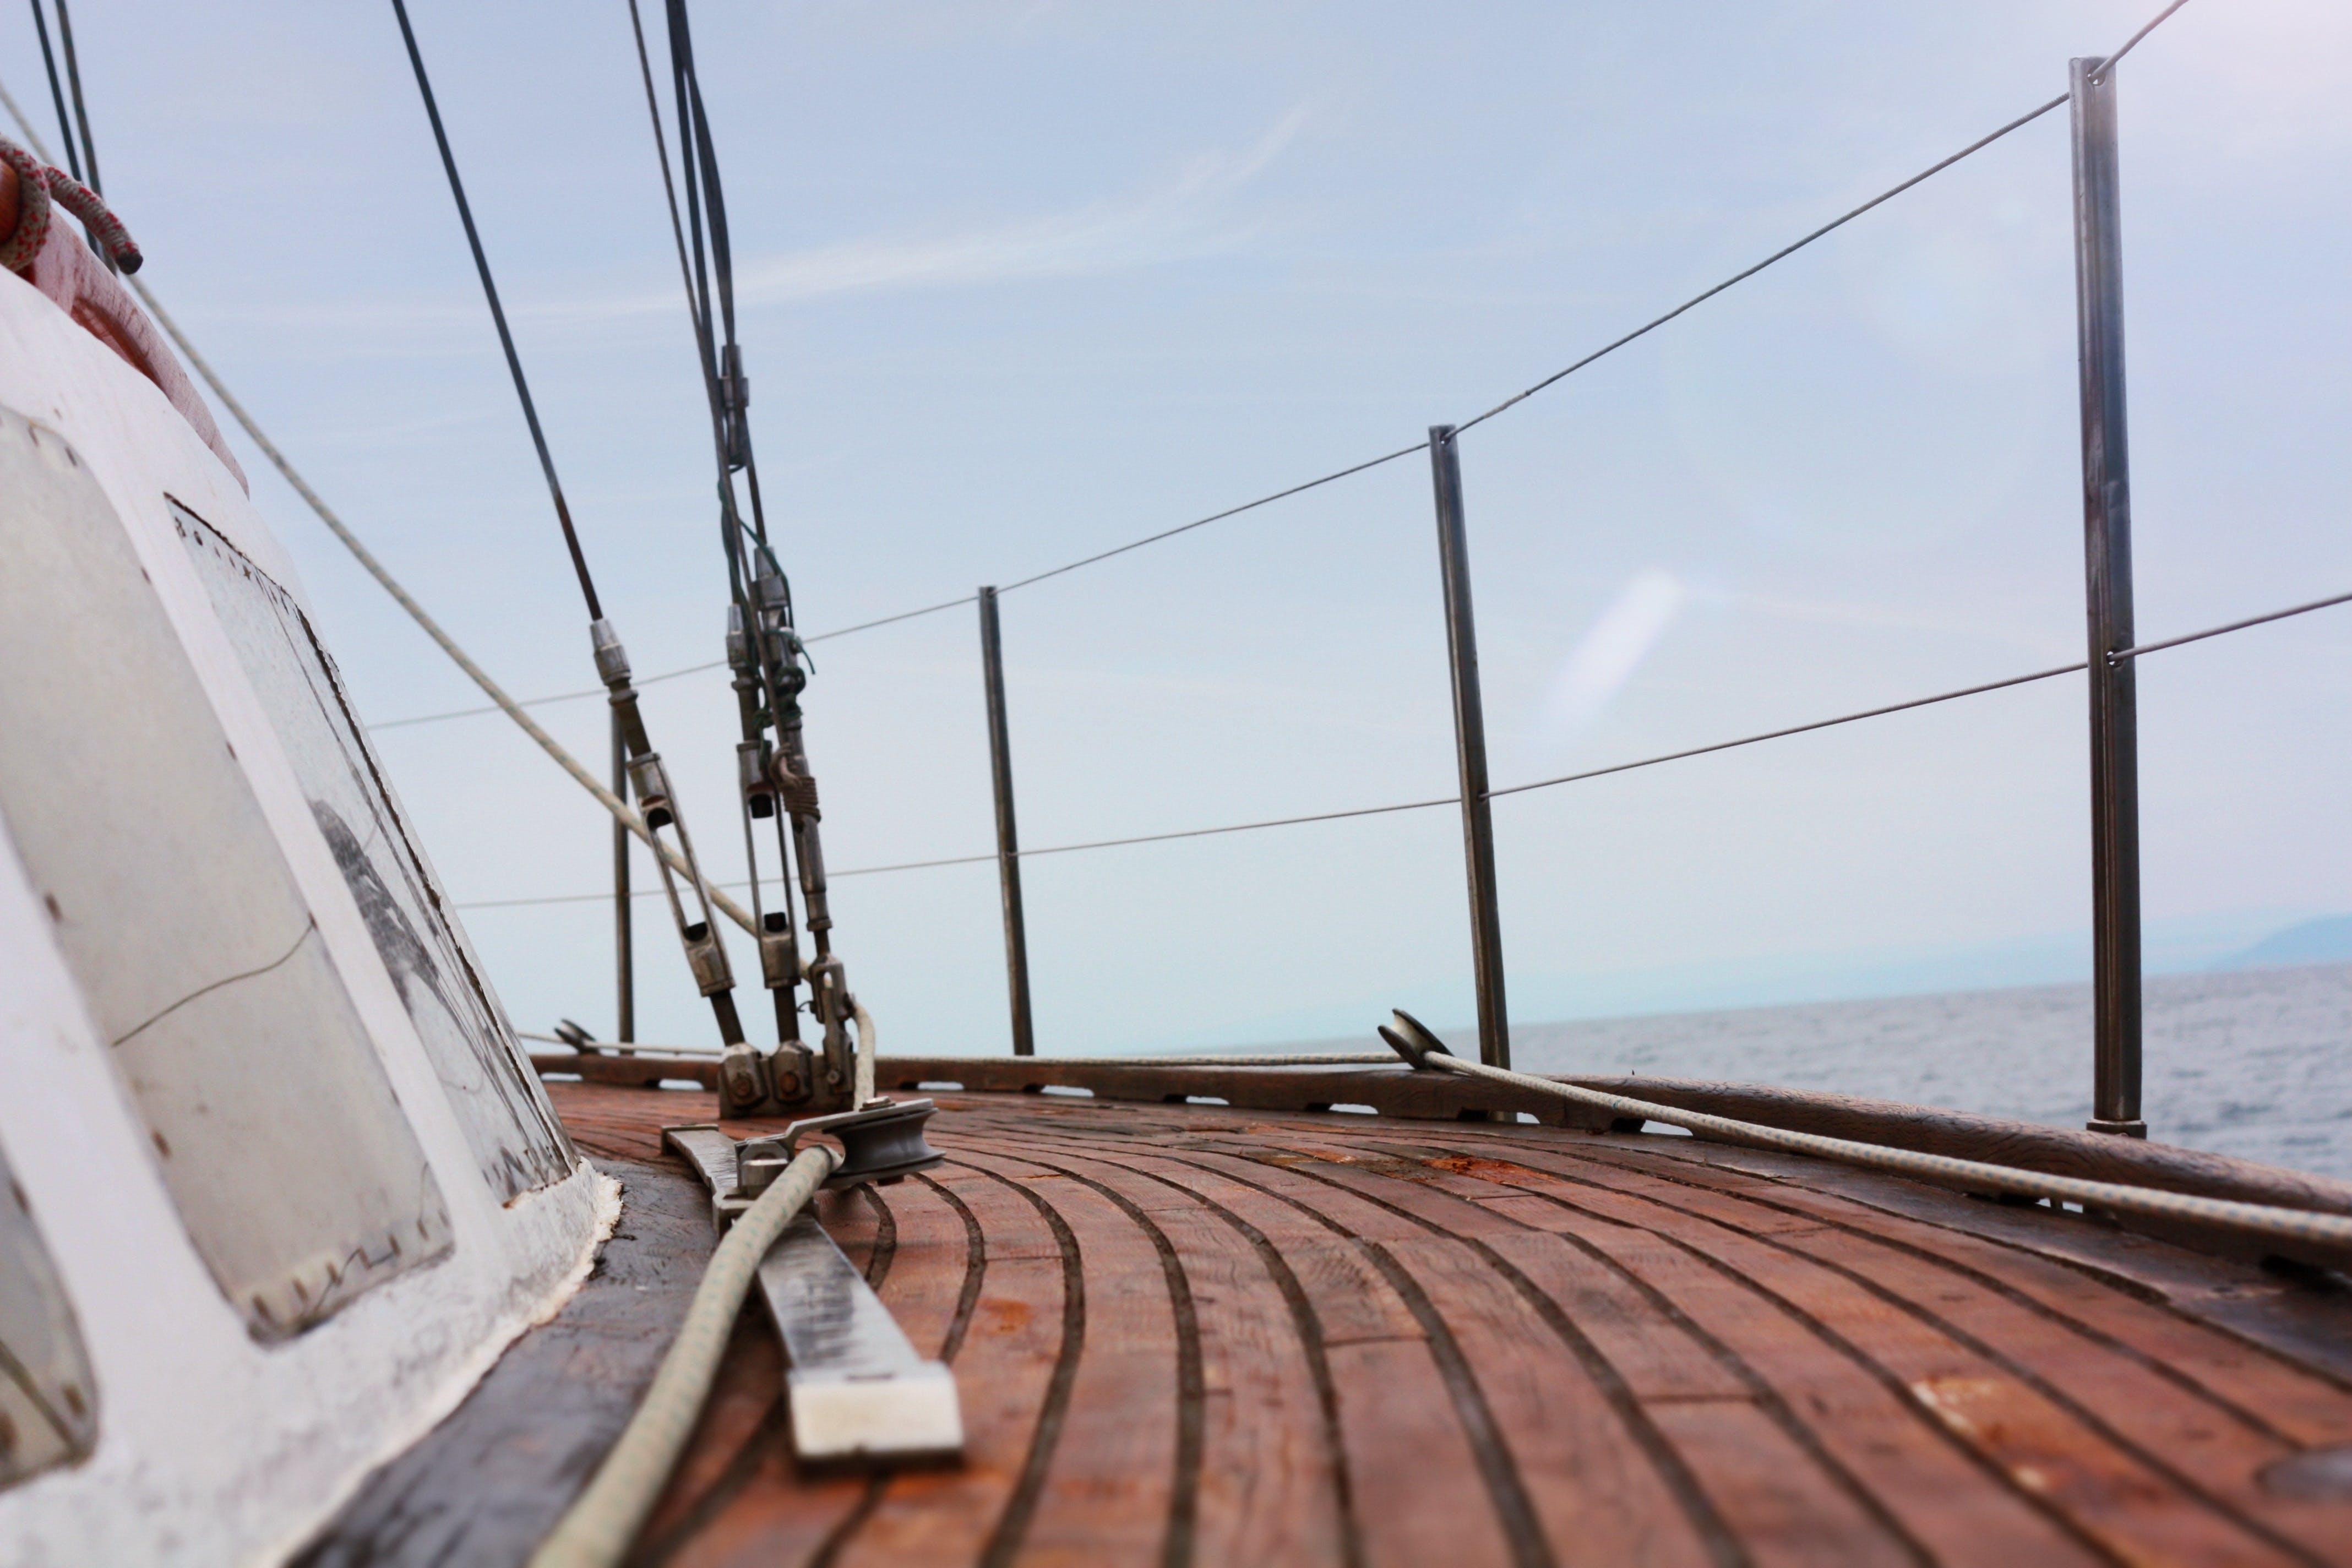 Free stock photo of Black Sea, boat, clear sky, islands